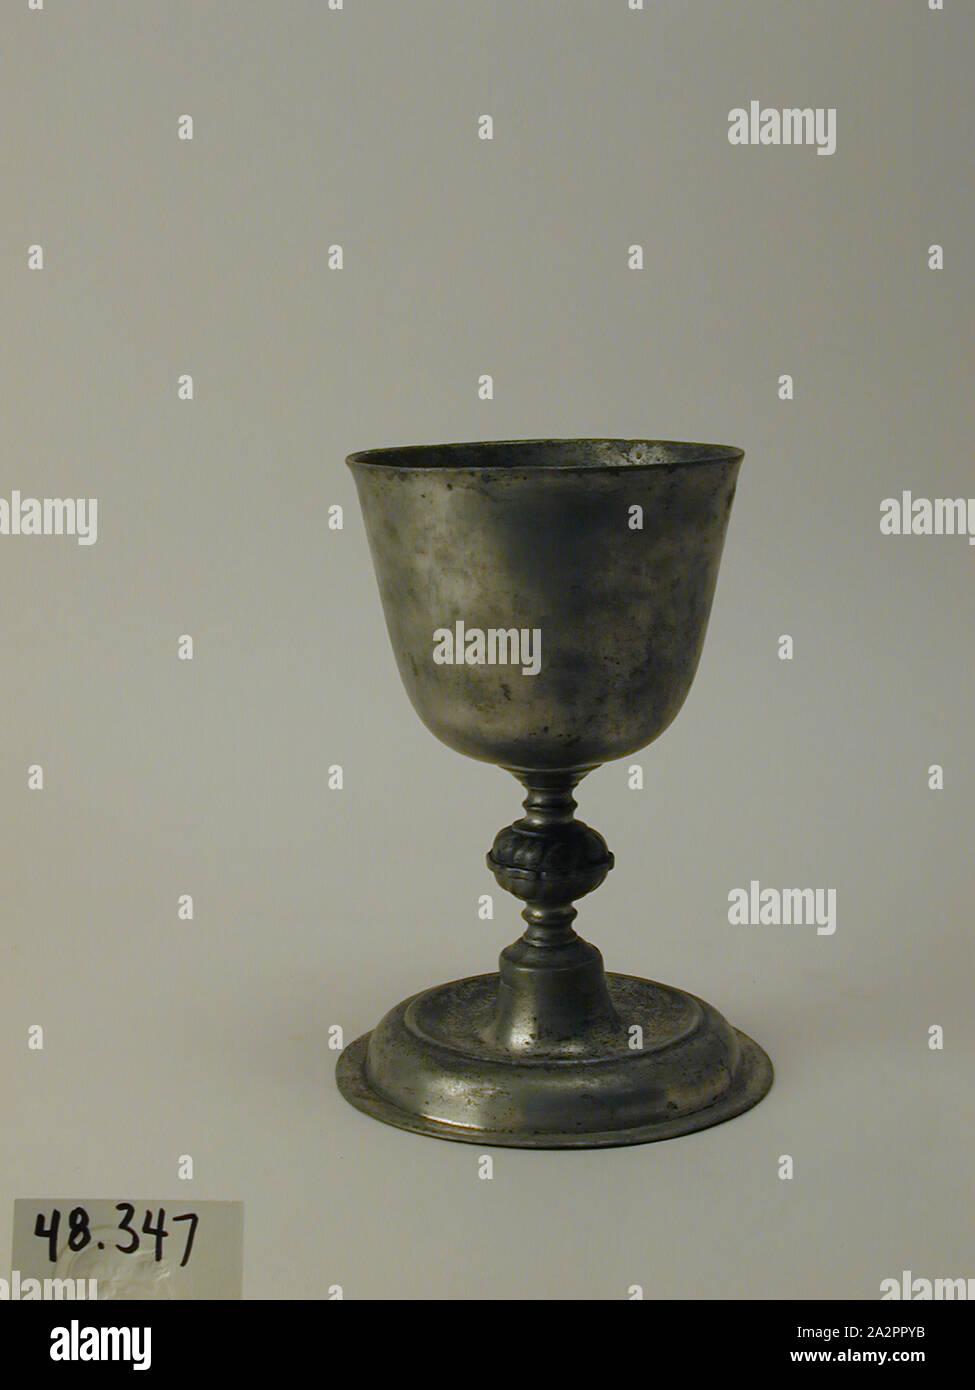 ENGLISH MEDIEVAL GOTHIC TANKARD GOBLET CHALICE GLASS DRINKING VESSEL W// SHIELDS